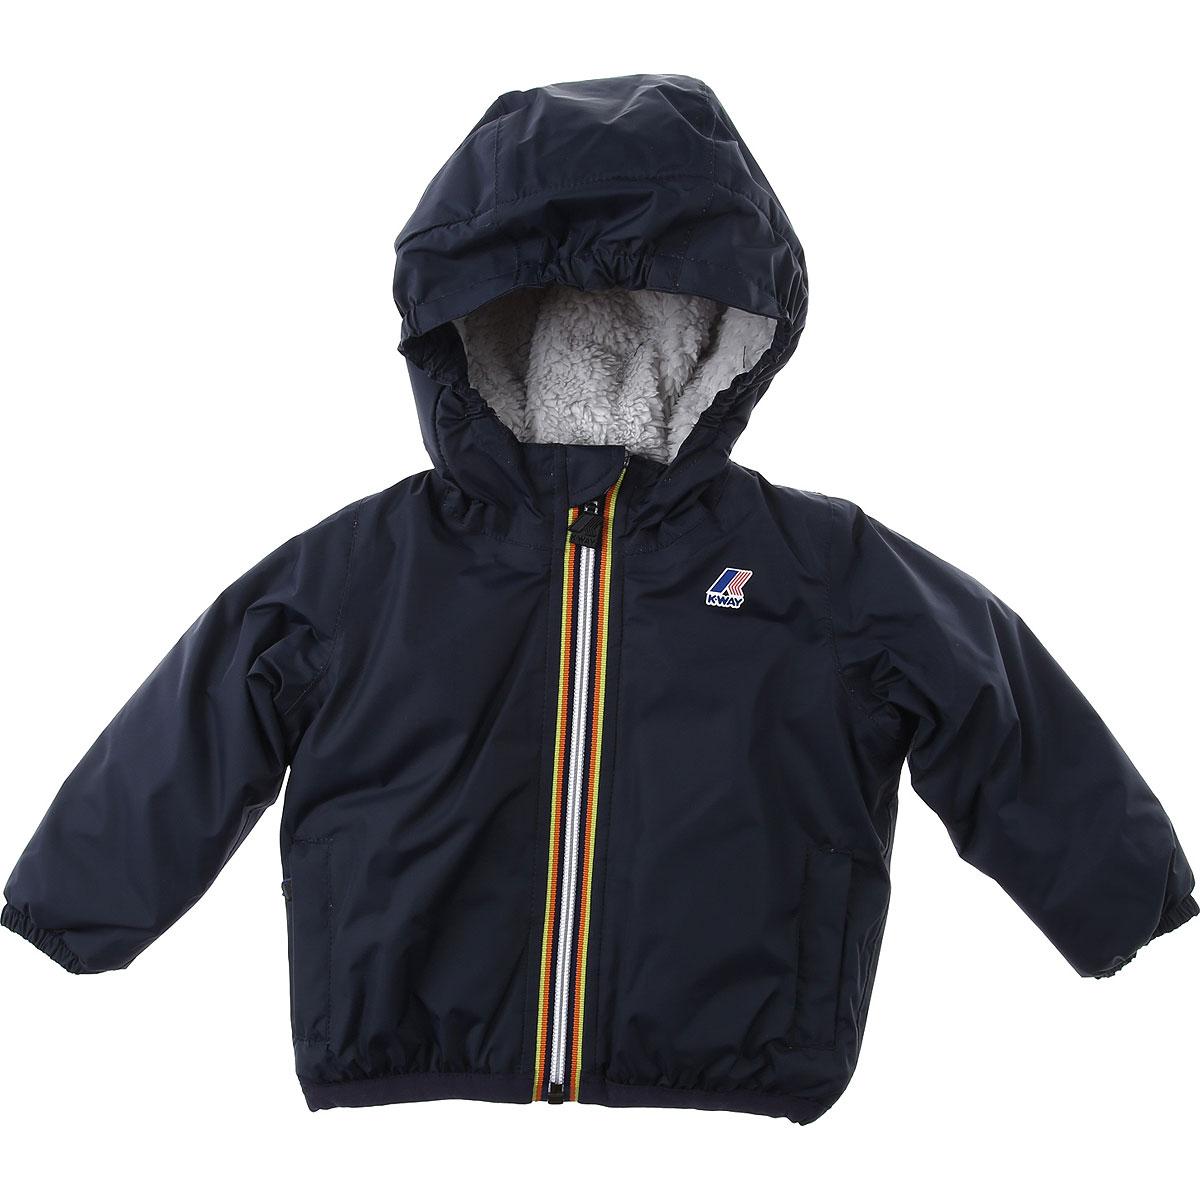 K-Way Baby Jacket for Boys On Sale, Depht Blue, polyamide, 2019, 12 M 18M 6M